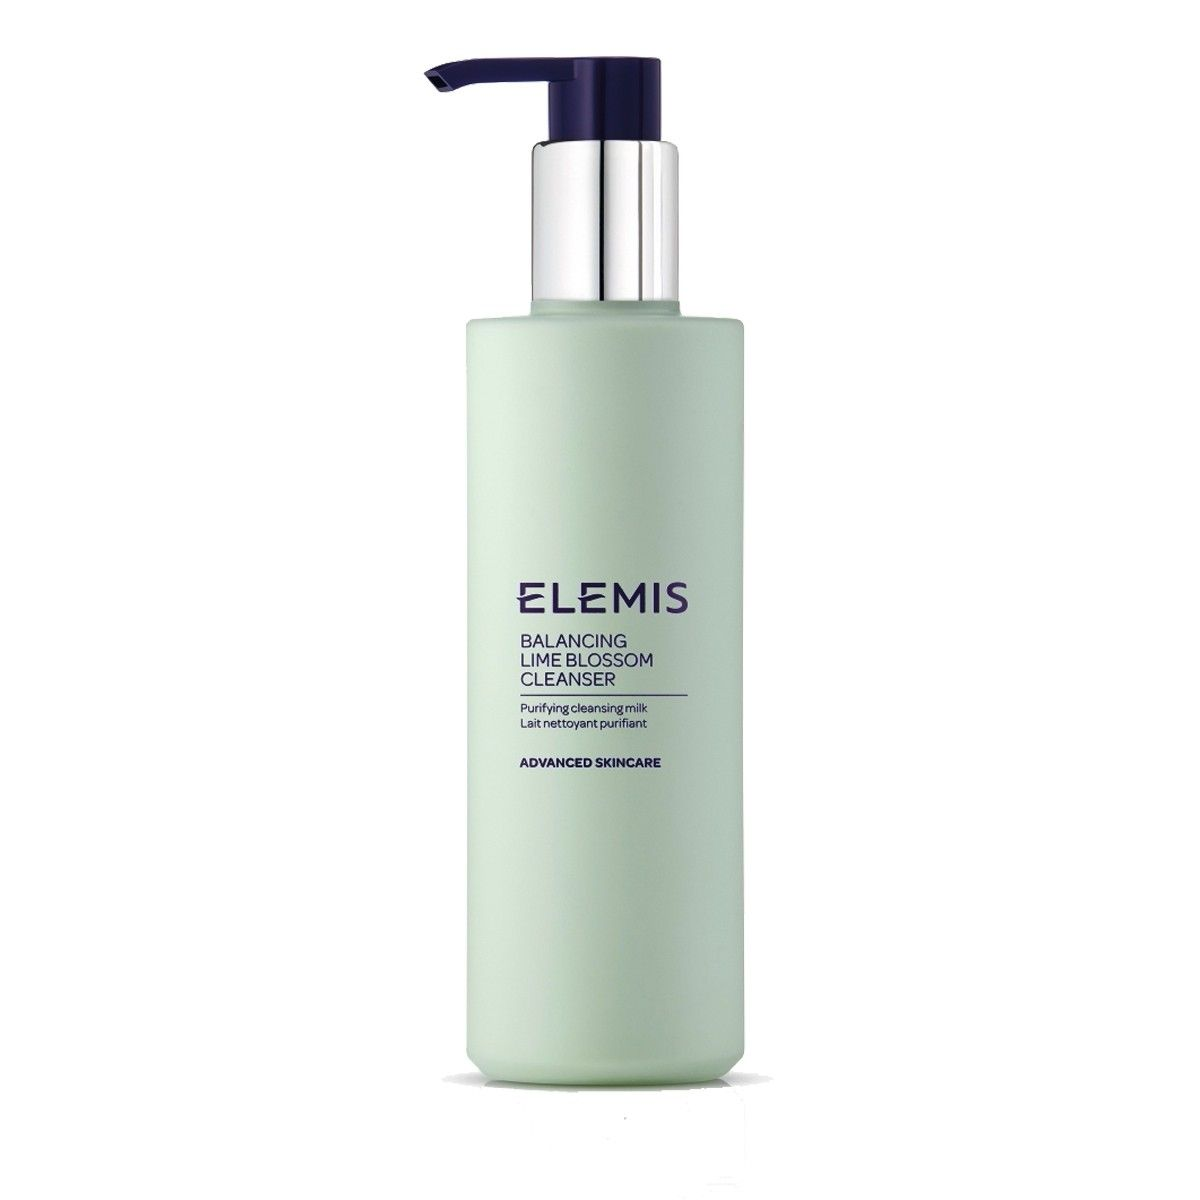 Afbeelding van Elemis Balancing Lime Blossom Cleanser Advanced Skincare Beauty